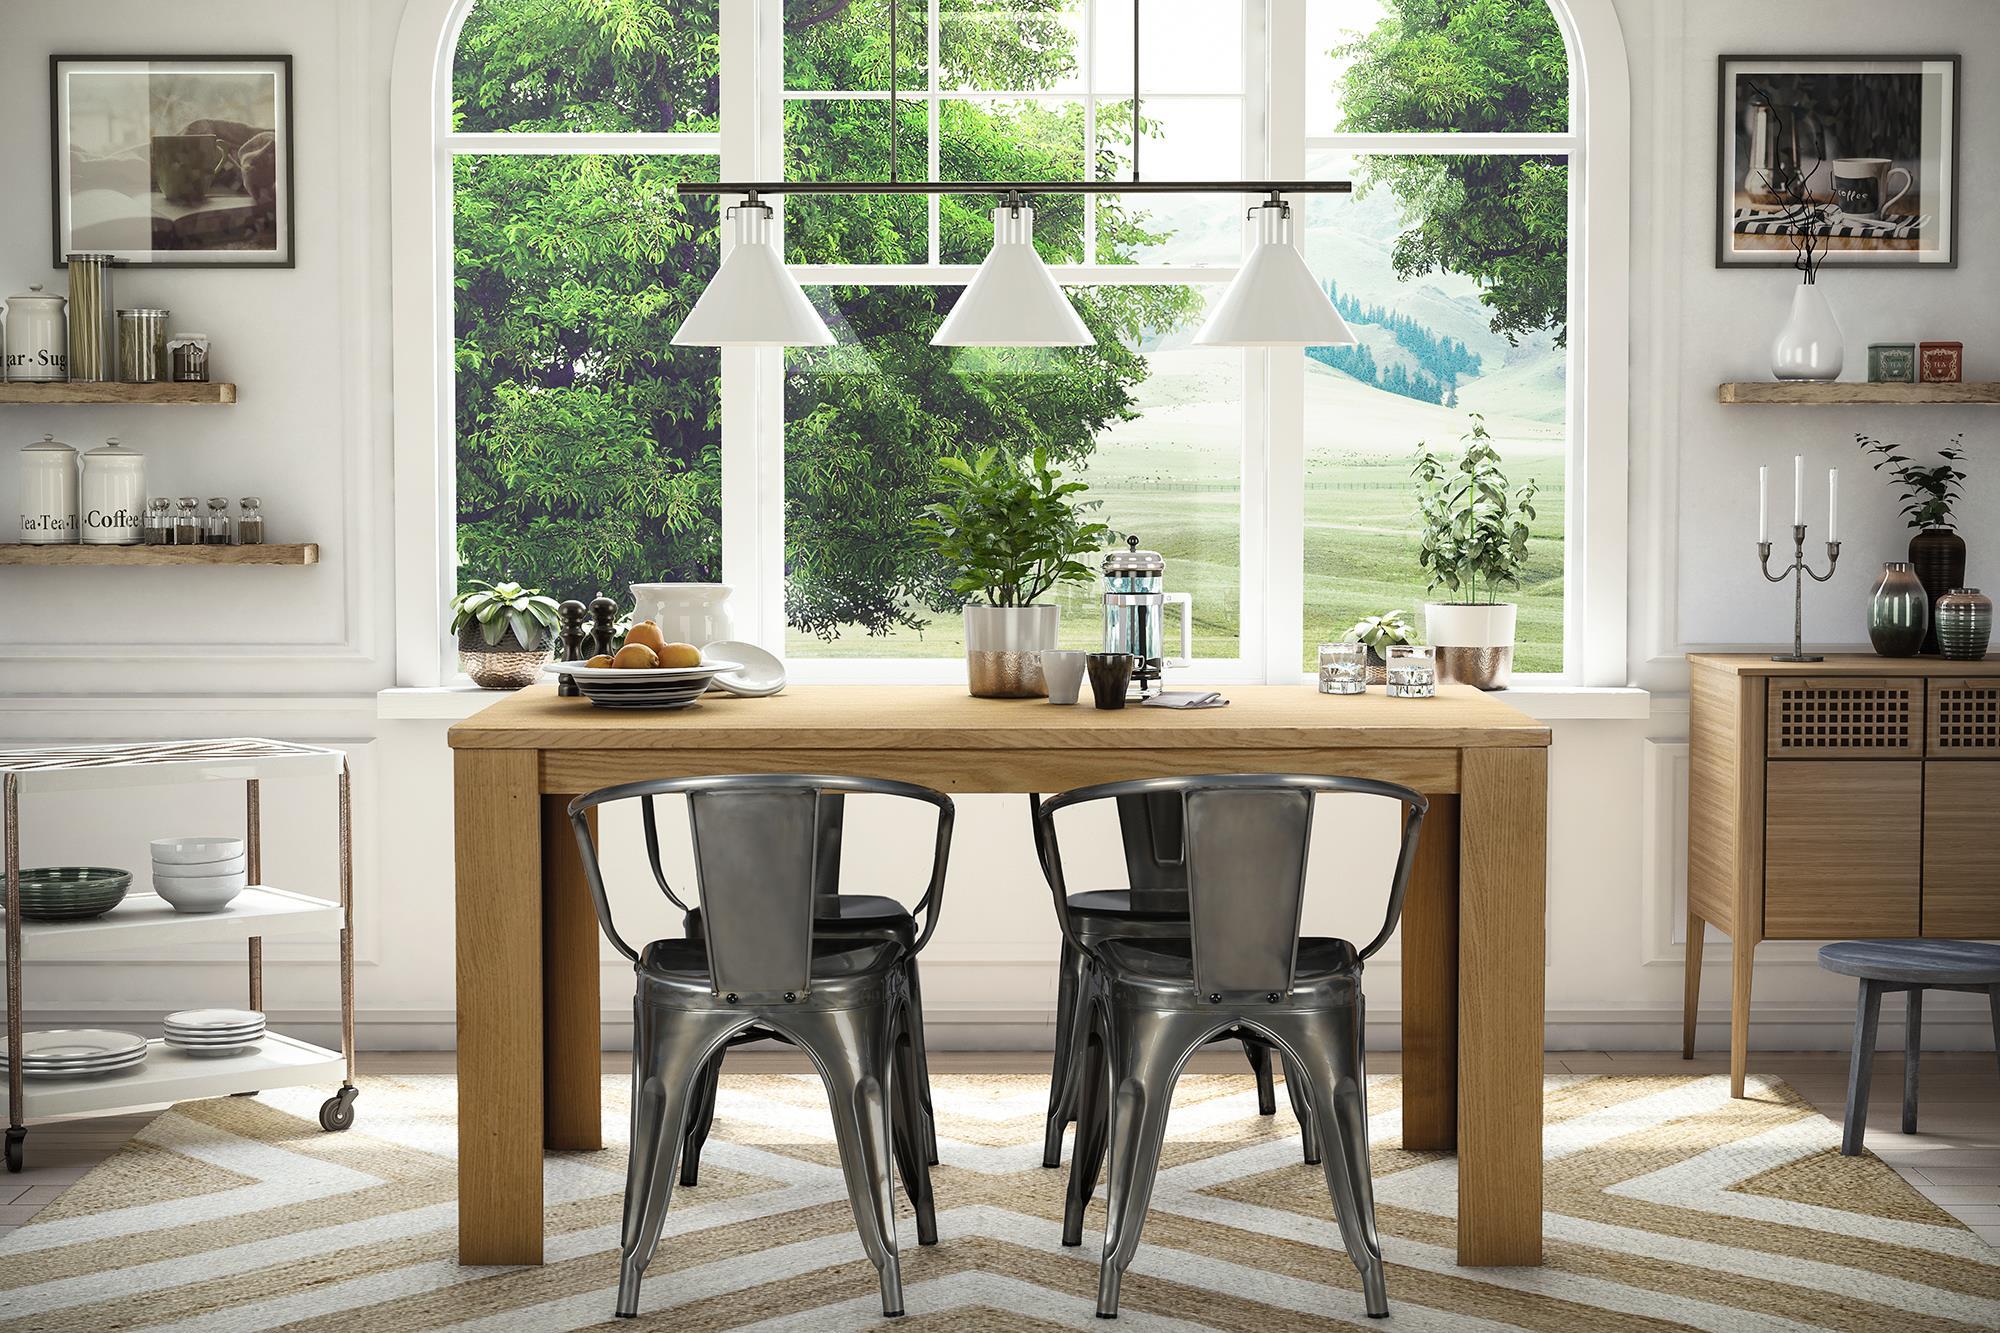 dorel home furnishings elise antique gunmetal metal dining chair set of 2 4 - Metal Dining Room Chairs